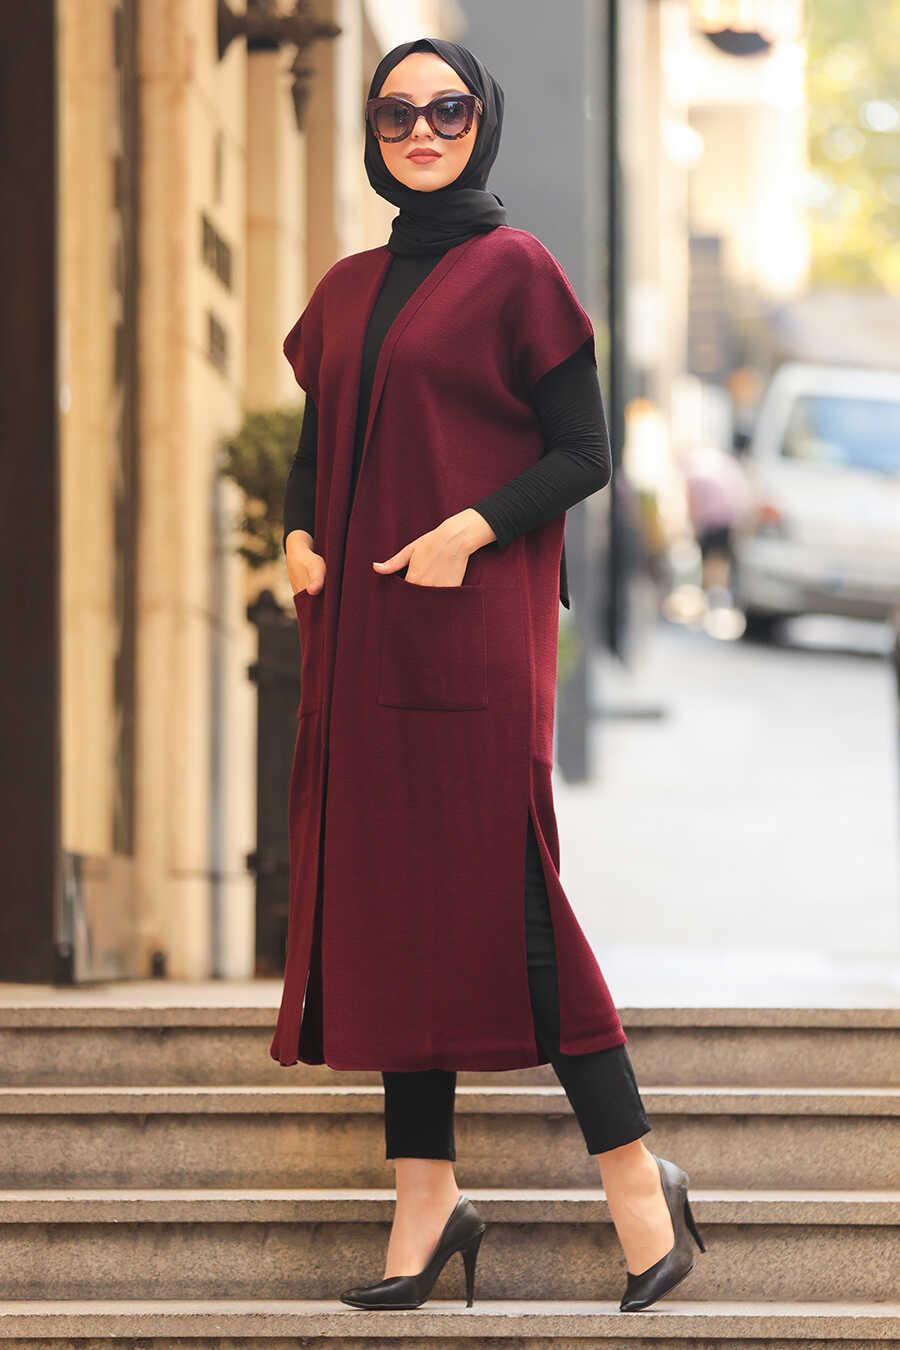 Claret Red Hijab Knitwear Vest 21920BR